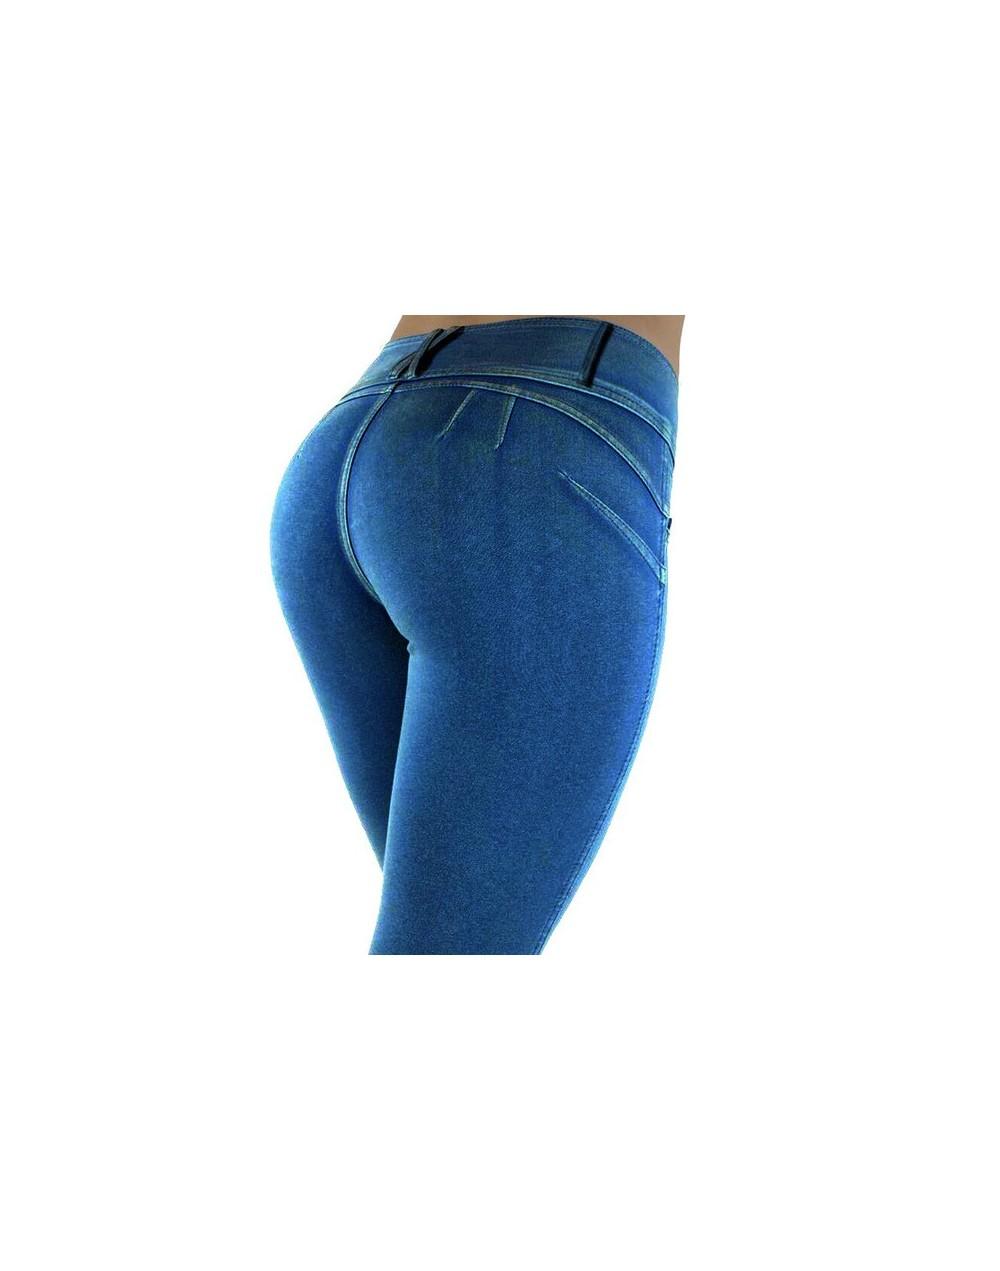 2016 Autumn New Fashion Pant Women Low Waist Pencil Pants Elastic Push Up Elastic Jeggings Sexy Bodybuilding Clothing Trouse...